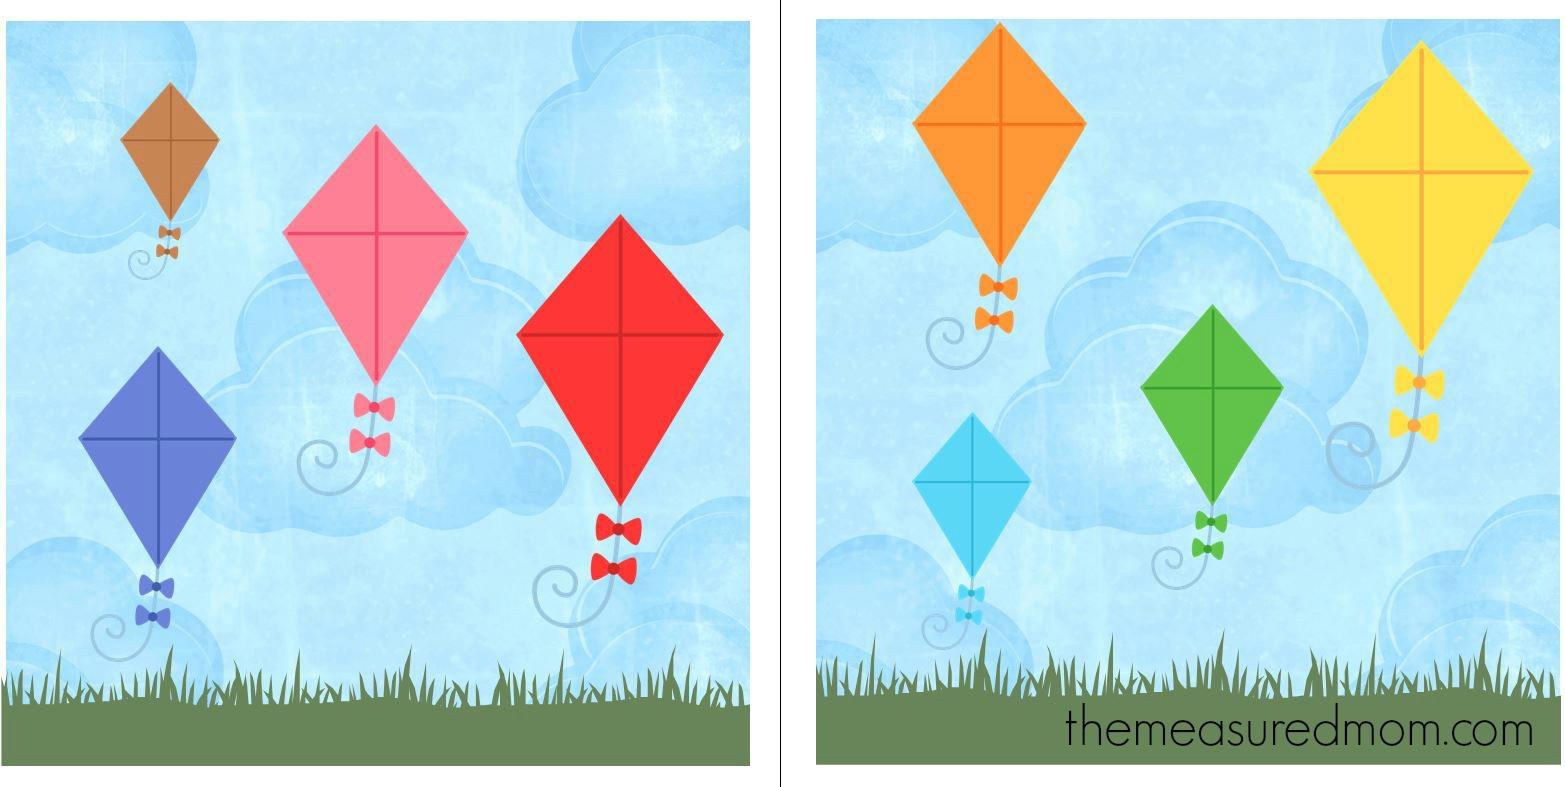 Free File Folder Game For Preschoolers: Kites! - The Measured Mom - Free Printable File Folders For Preschoolers